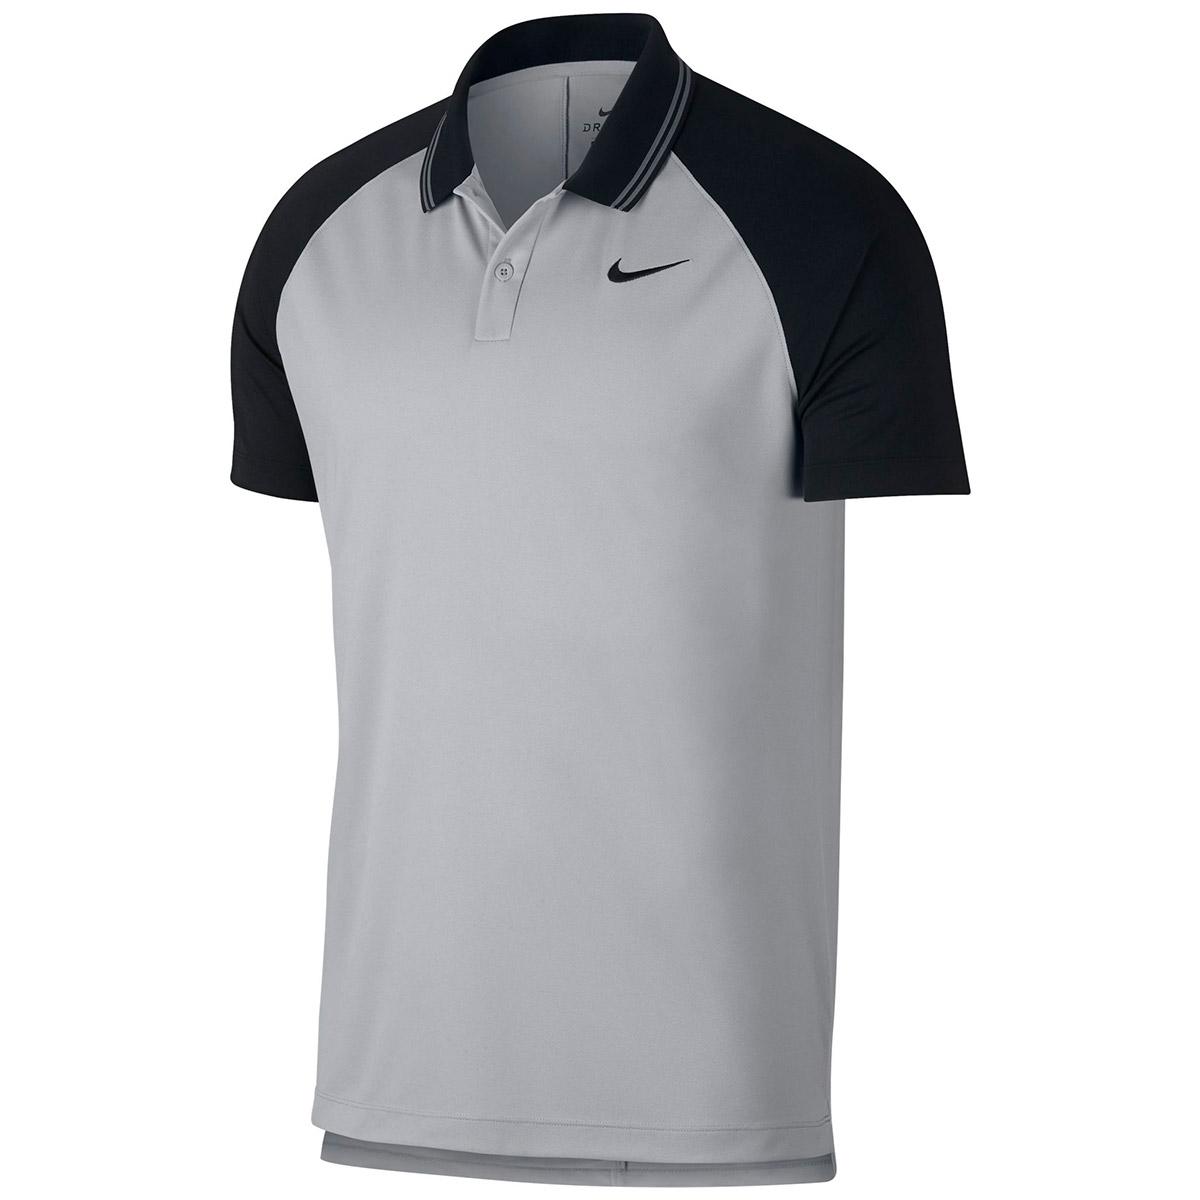 4ef704f857 Nike Golf Essential Tipped Polo Shirt